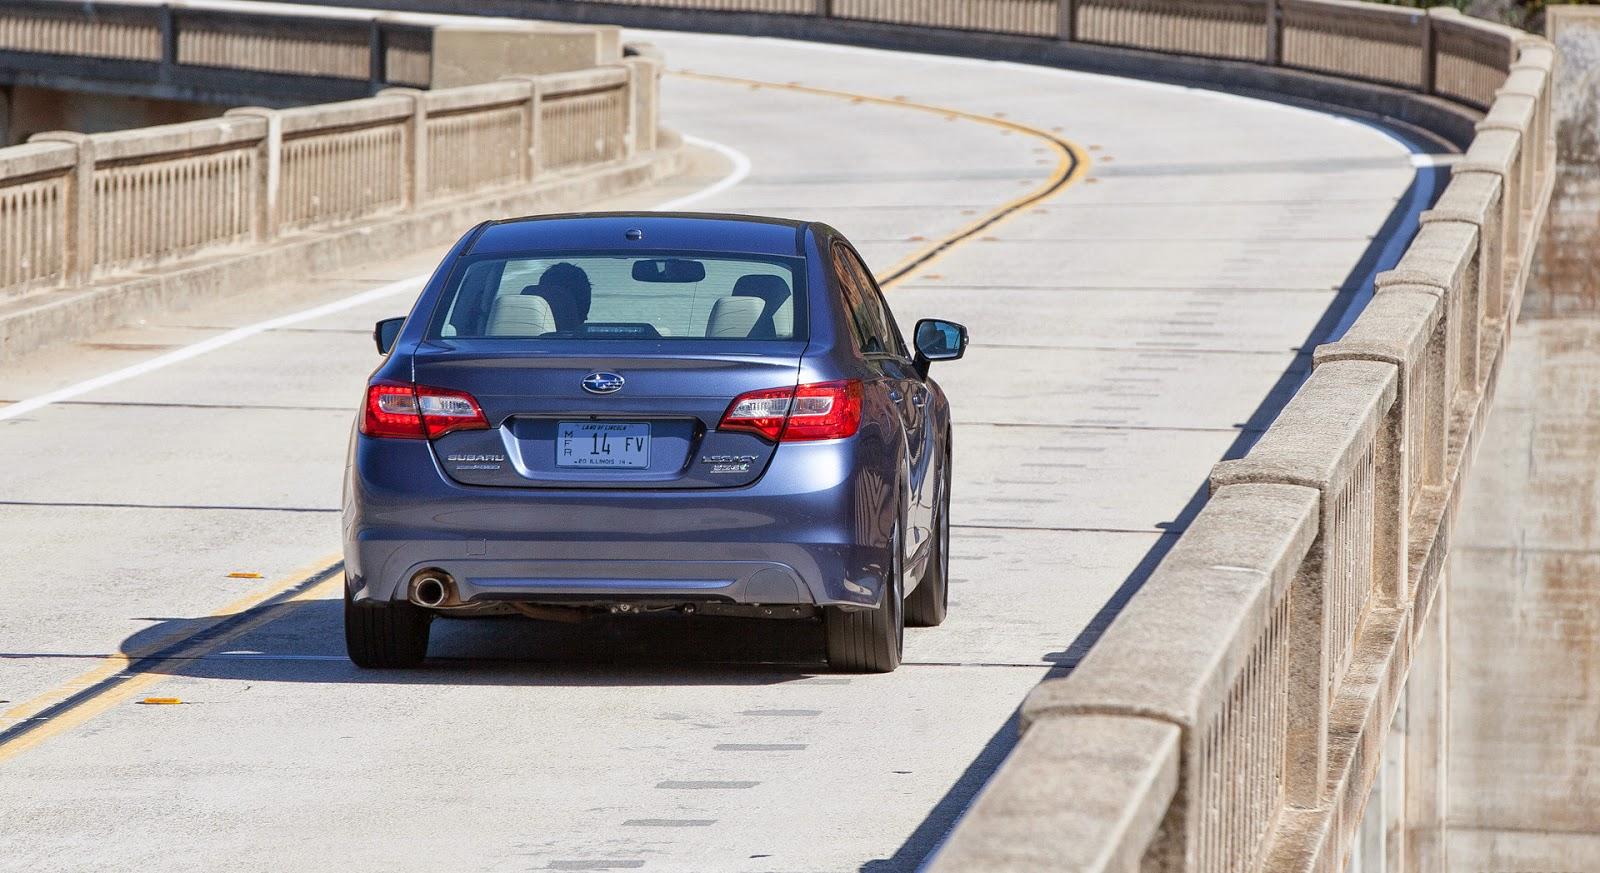 New Subaru Used Car Dealership Auto Parts Service Finance